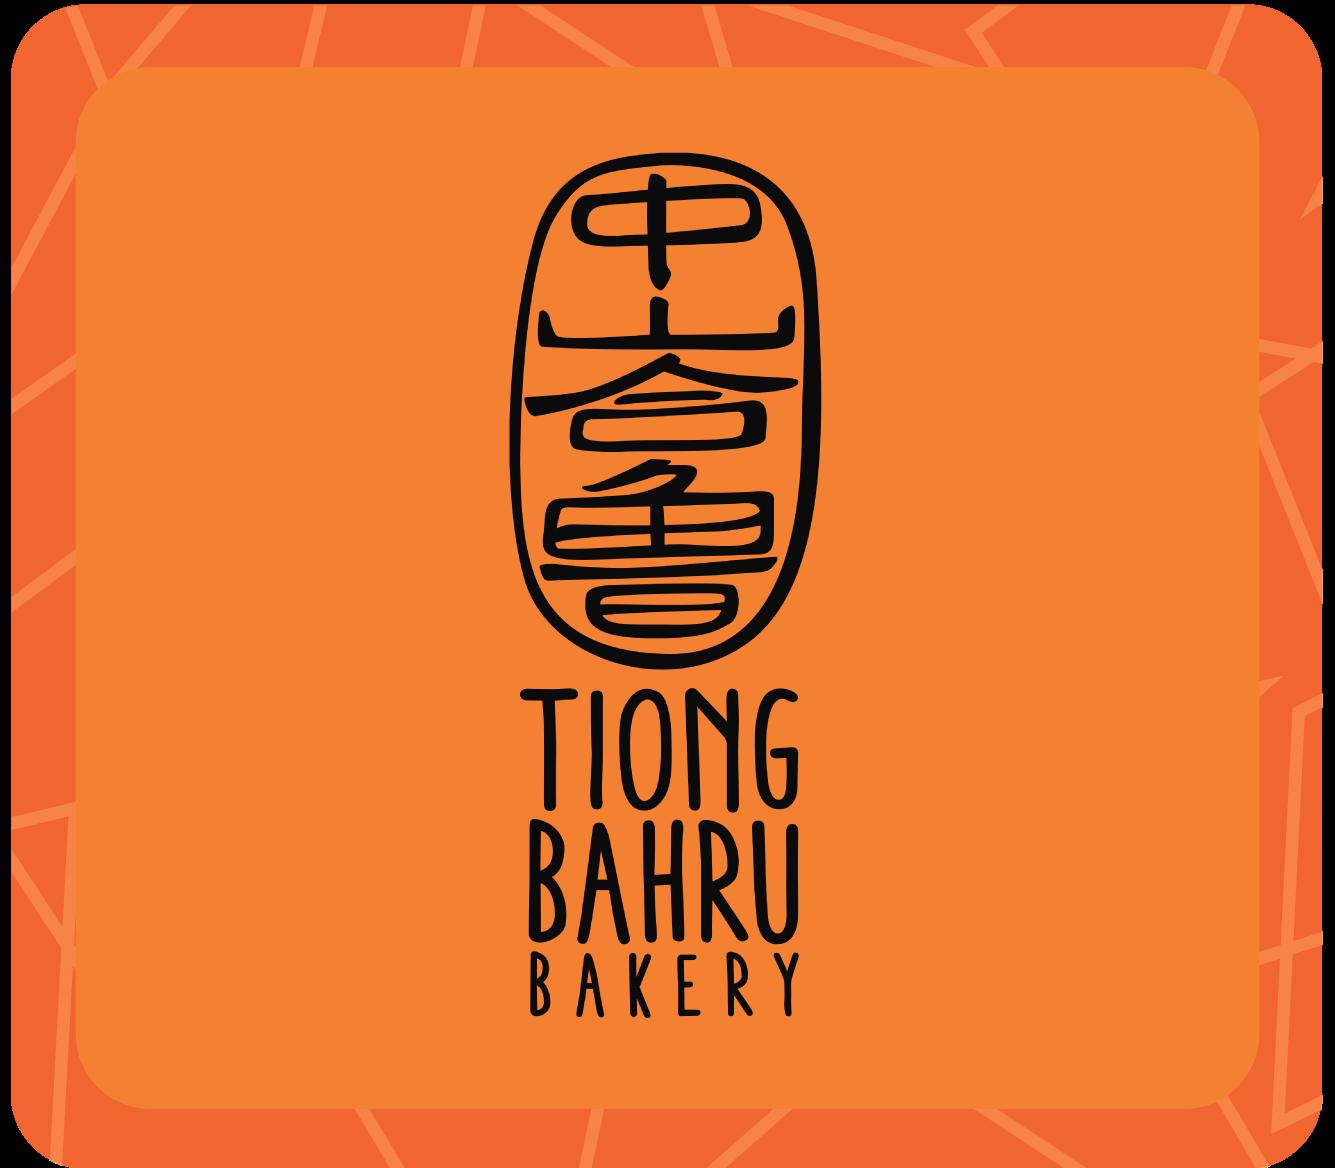 Climb Central x Tiong Bahru Bakery